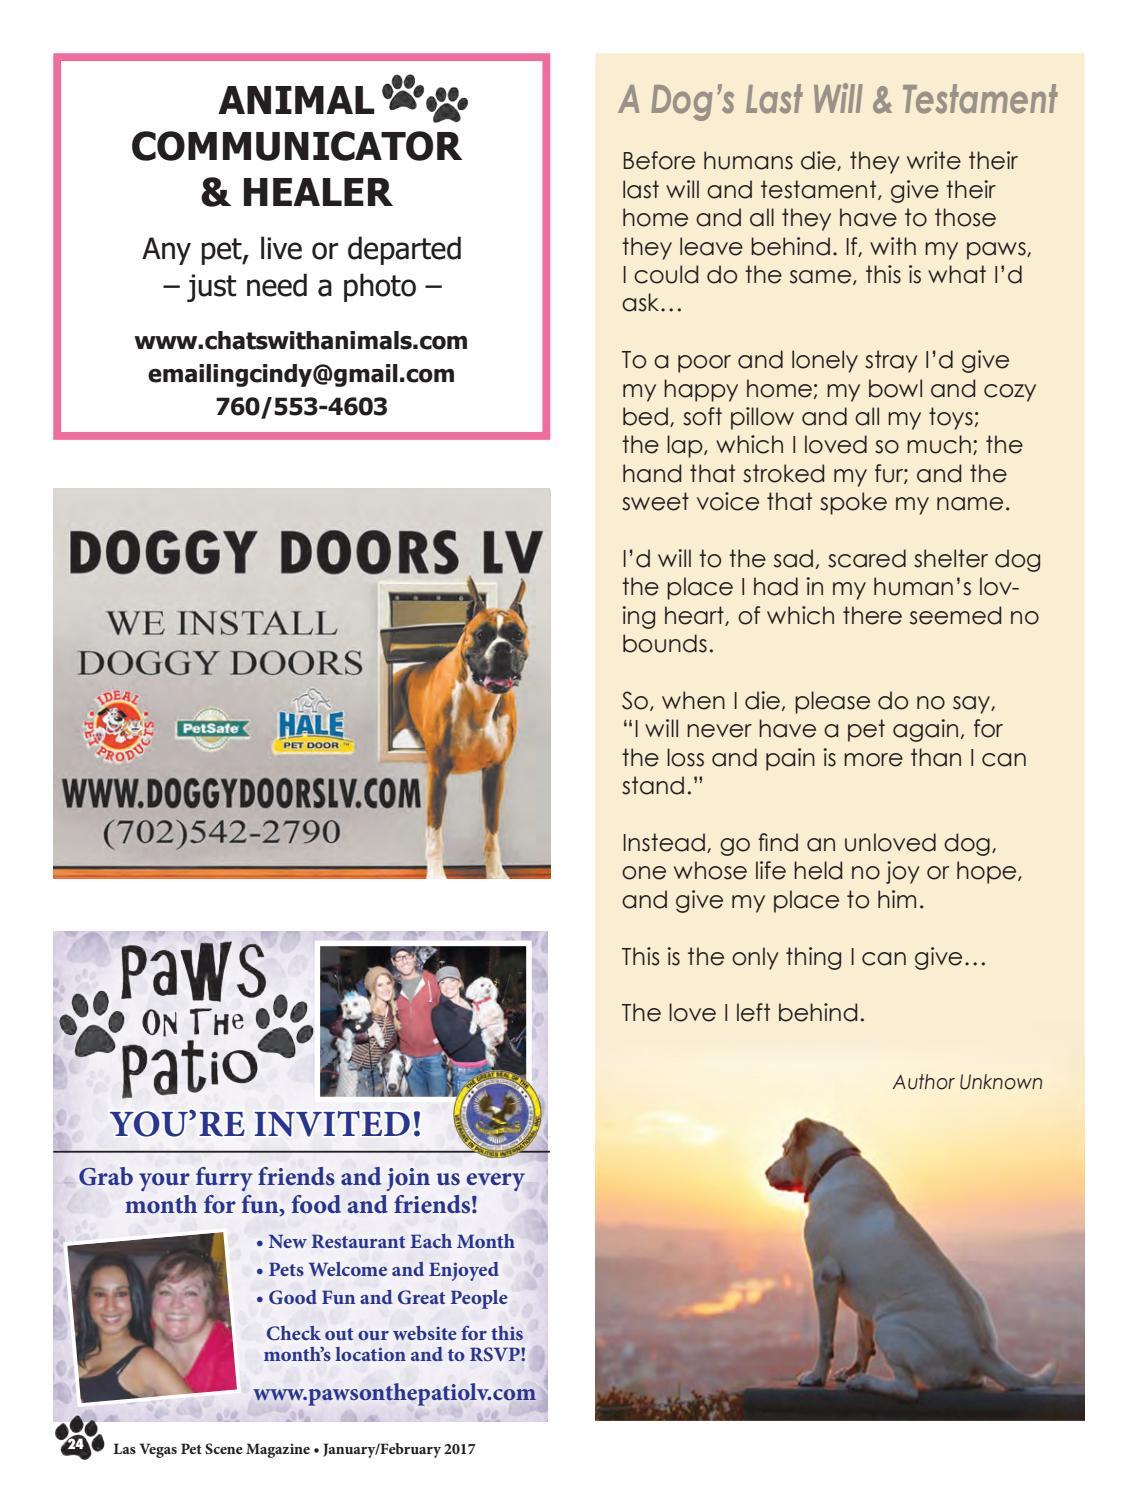 Las Vegas Pet Scene Magazine – January/February 2017 by Homes